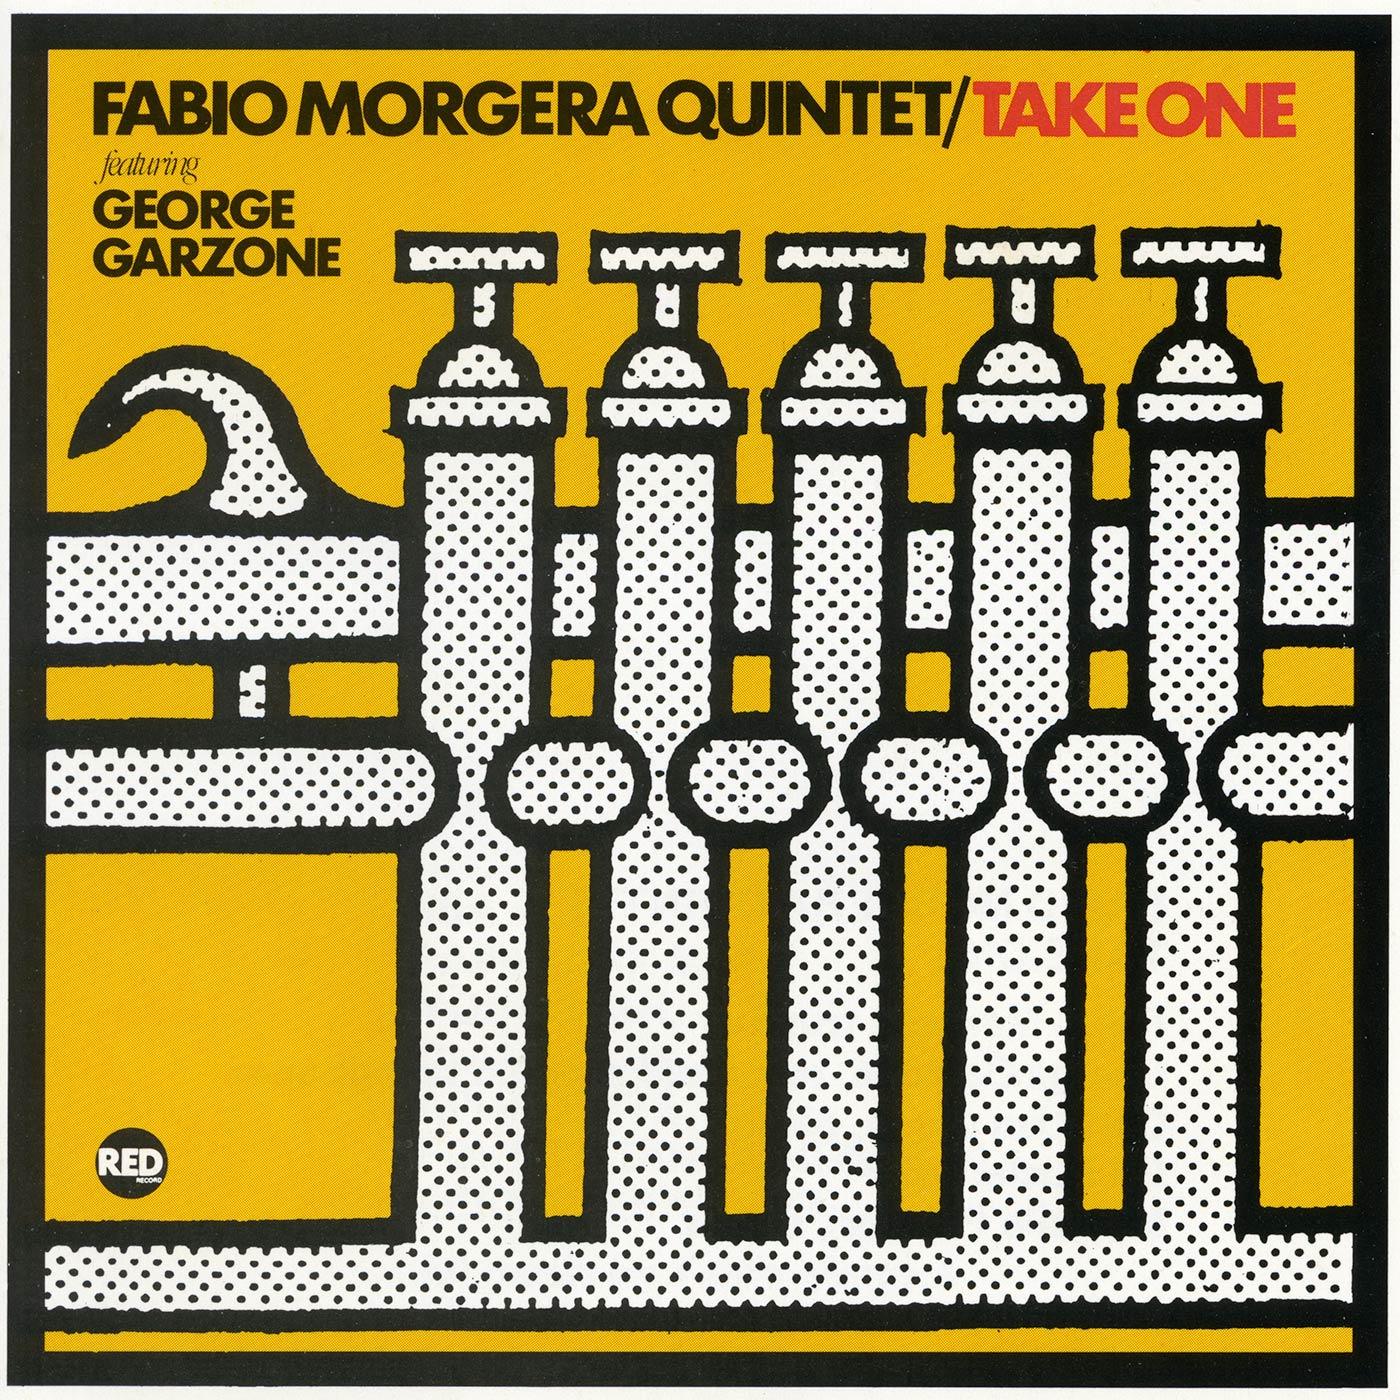 Take One - Fabio Morgera Quintet